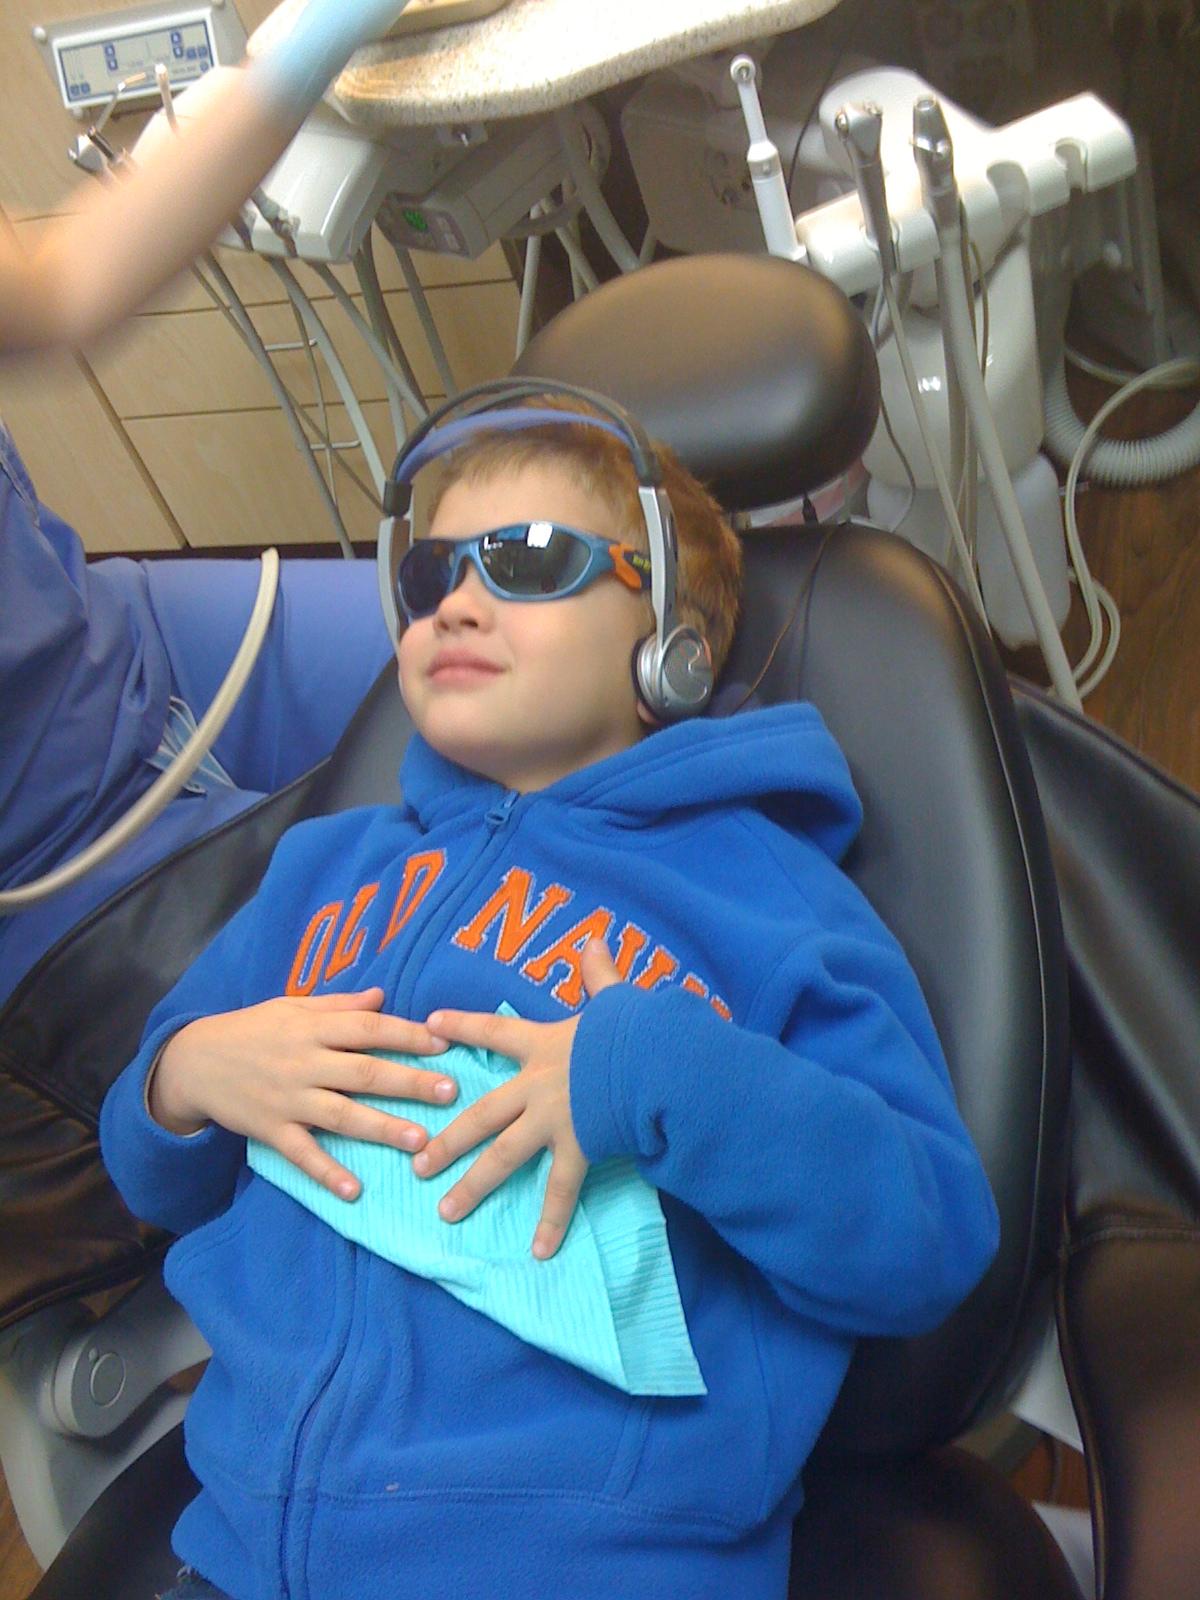 A trip to the dentist descriptive essay